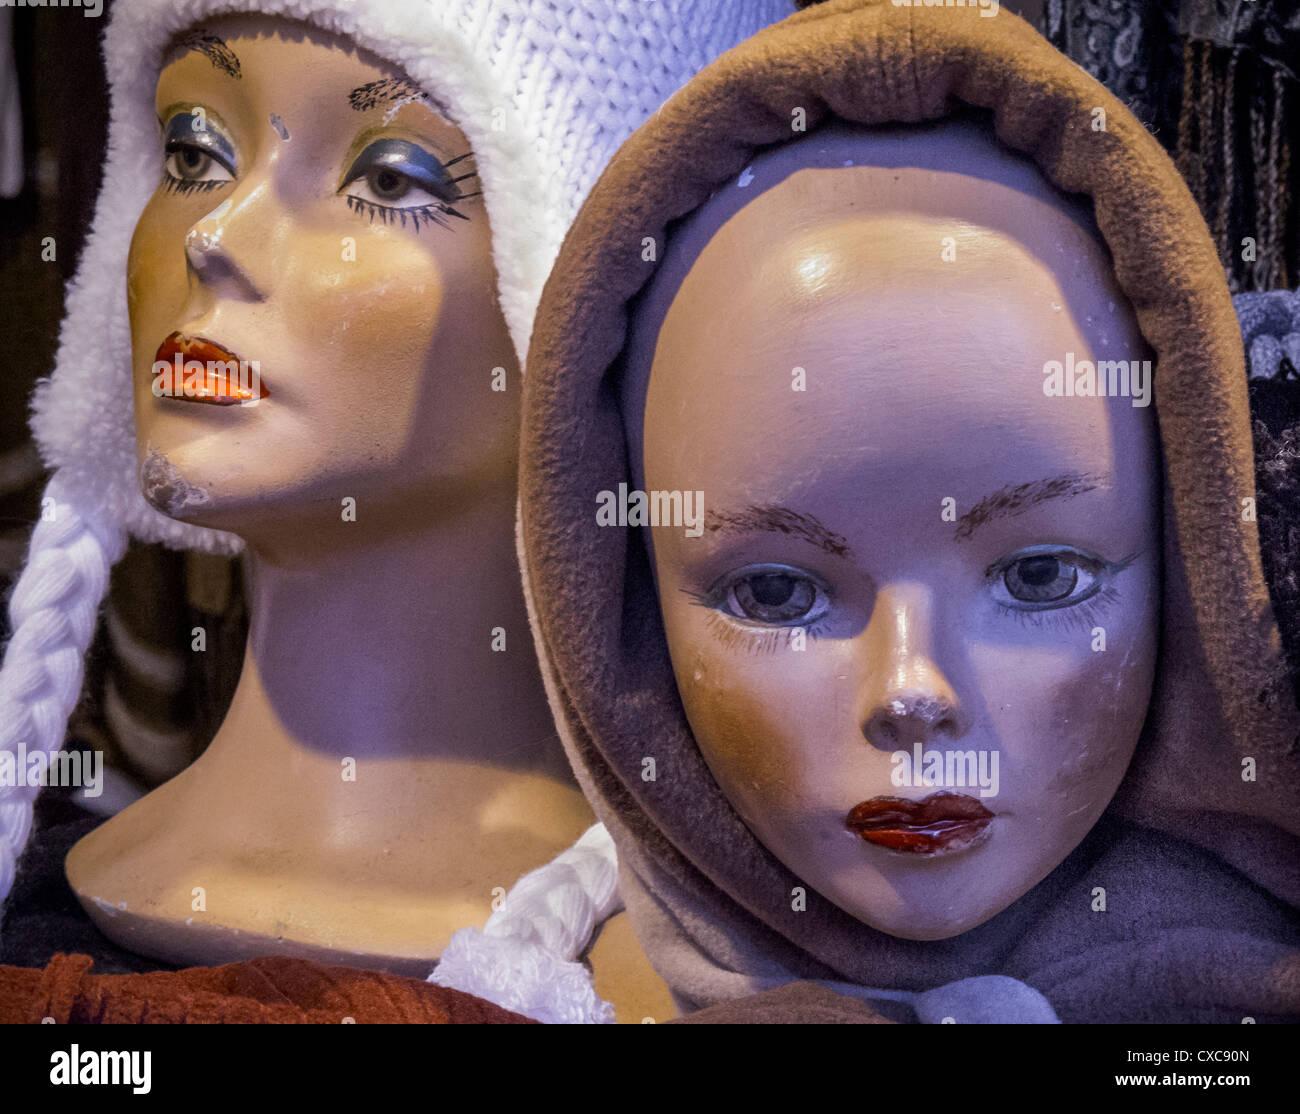 Maniqui maltratadas jefes mostrar sombreros a un mercado de Navidad en  Potsdam fcc2484e5c7